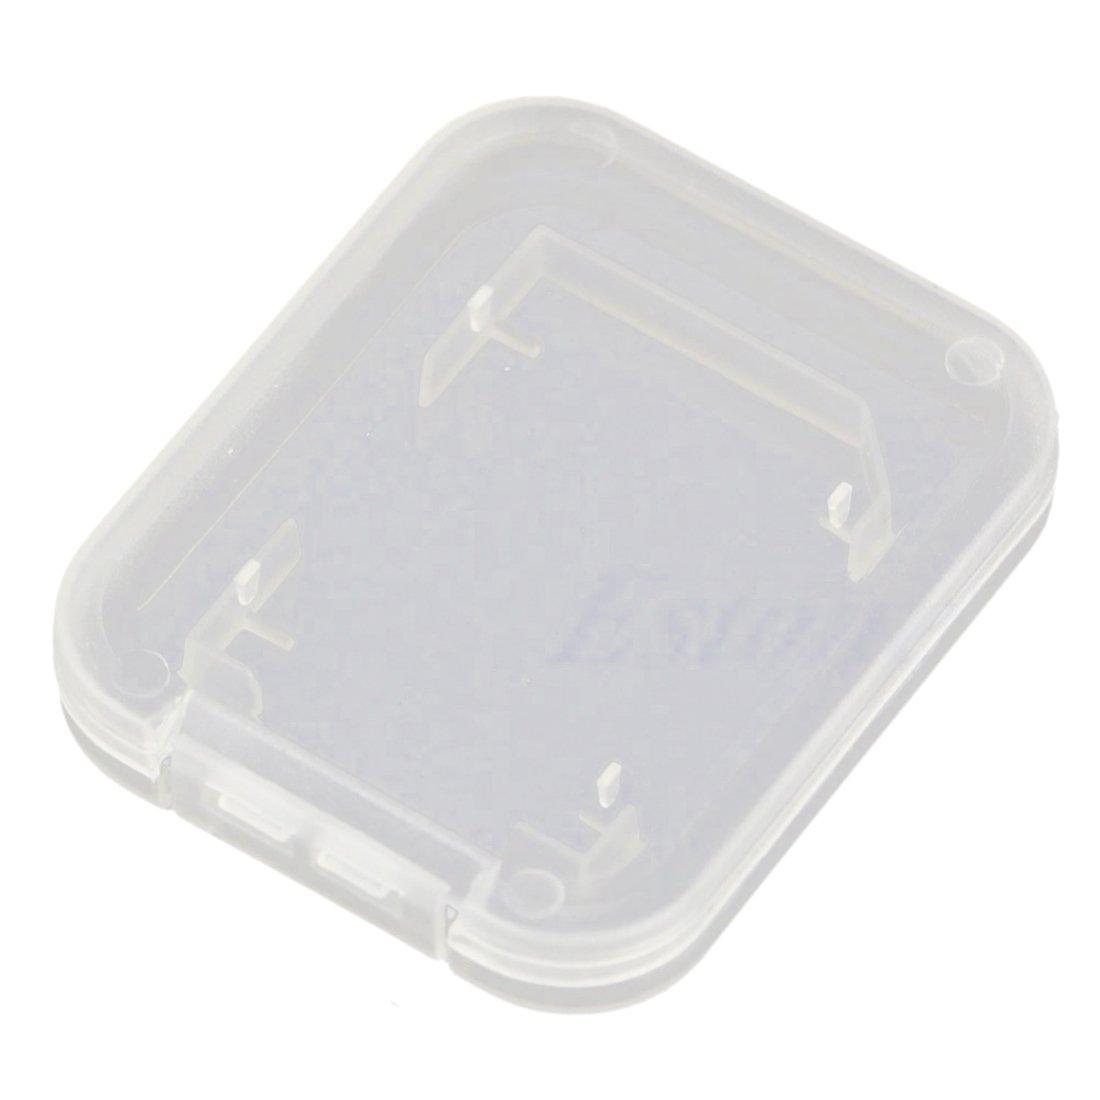 10 Pcs SD SDHC Memory Card Case Holder Protector Transparent Plastic Box Storage product image